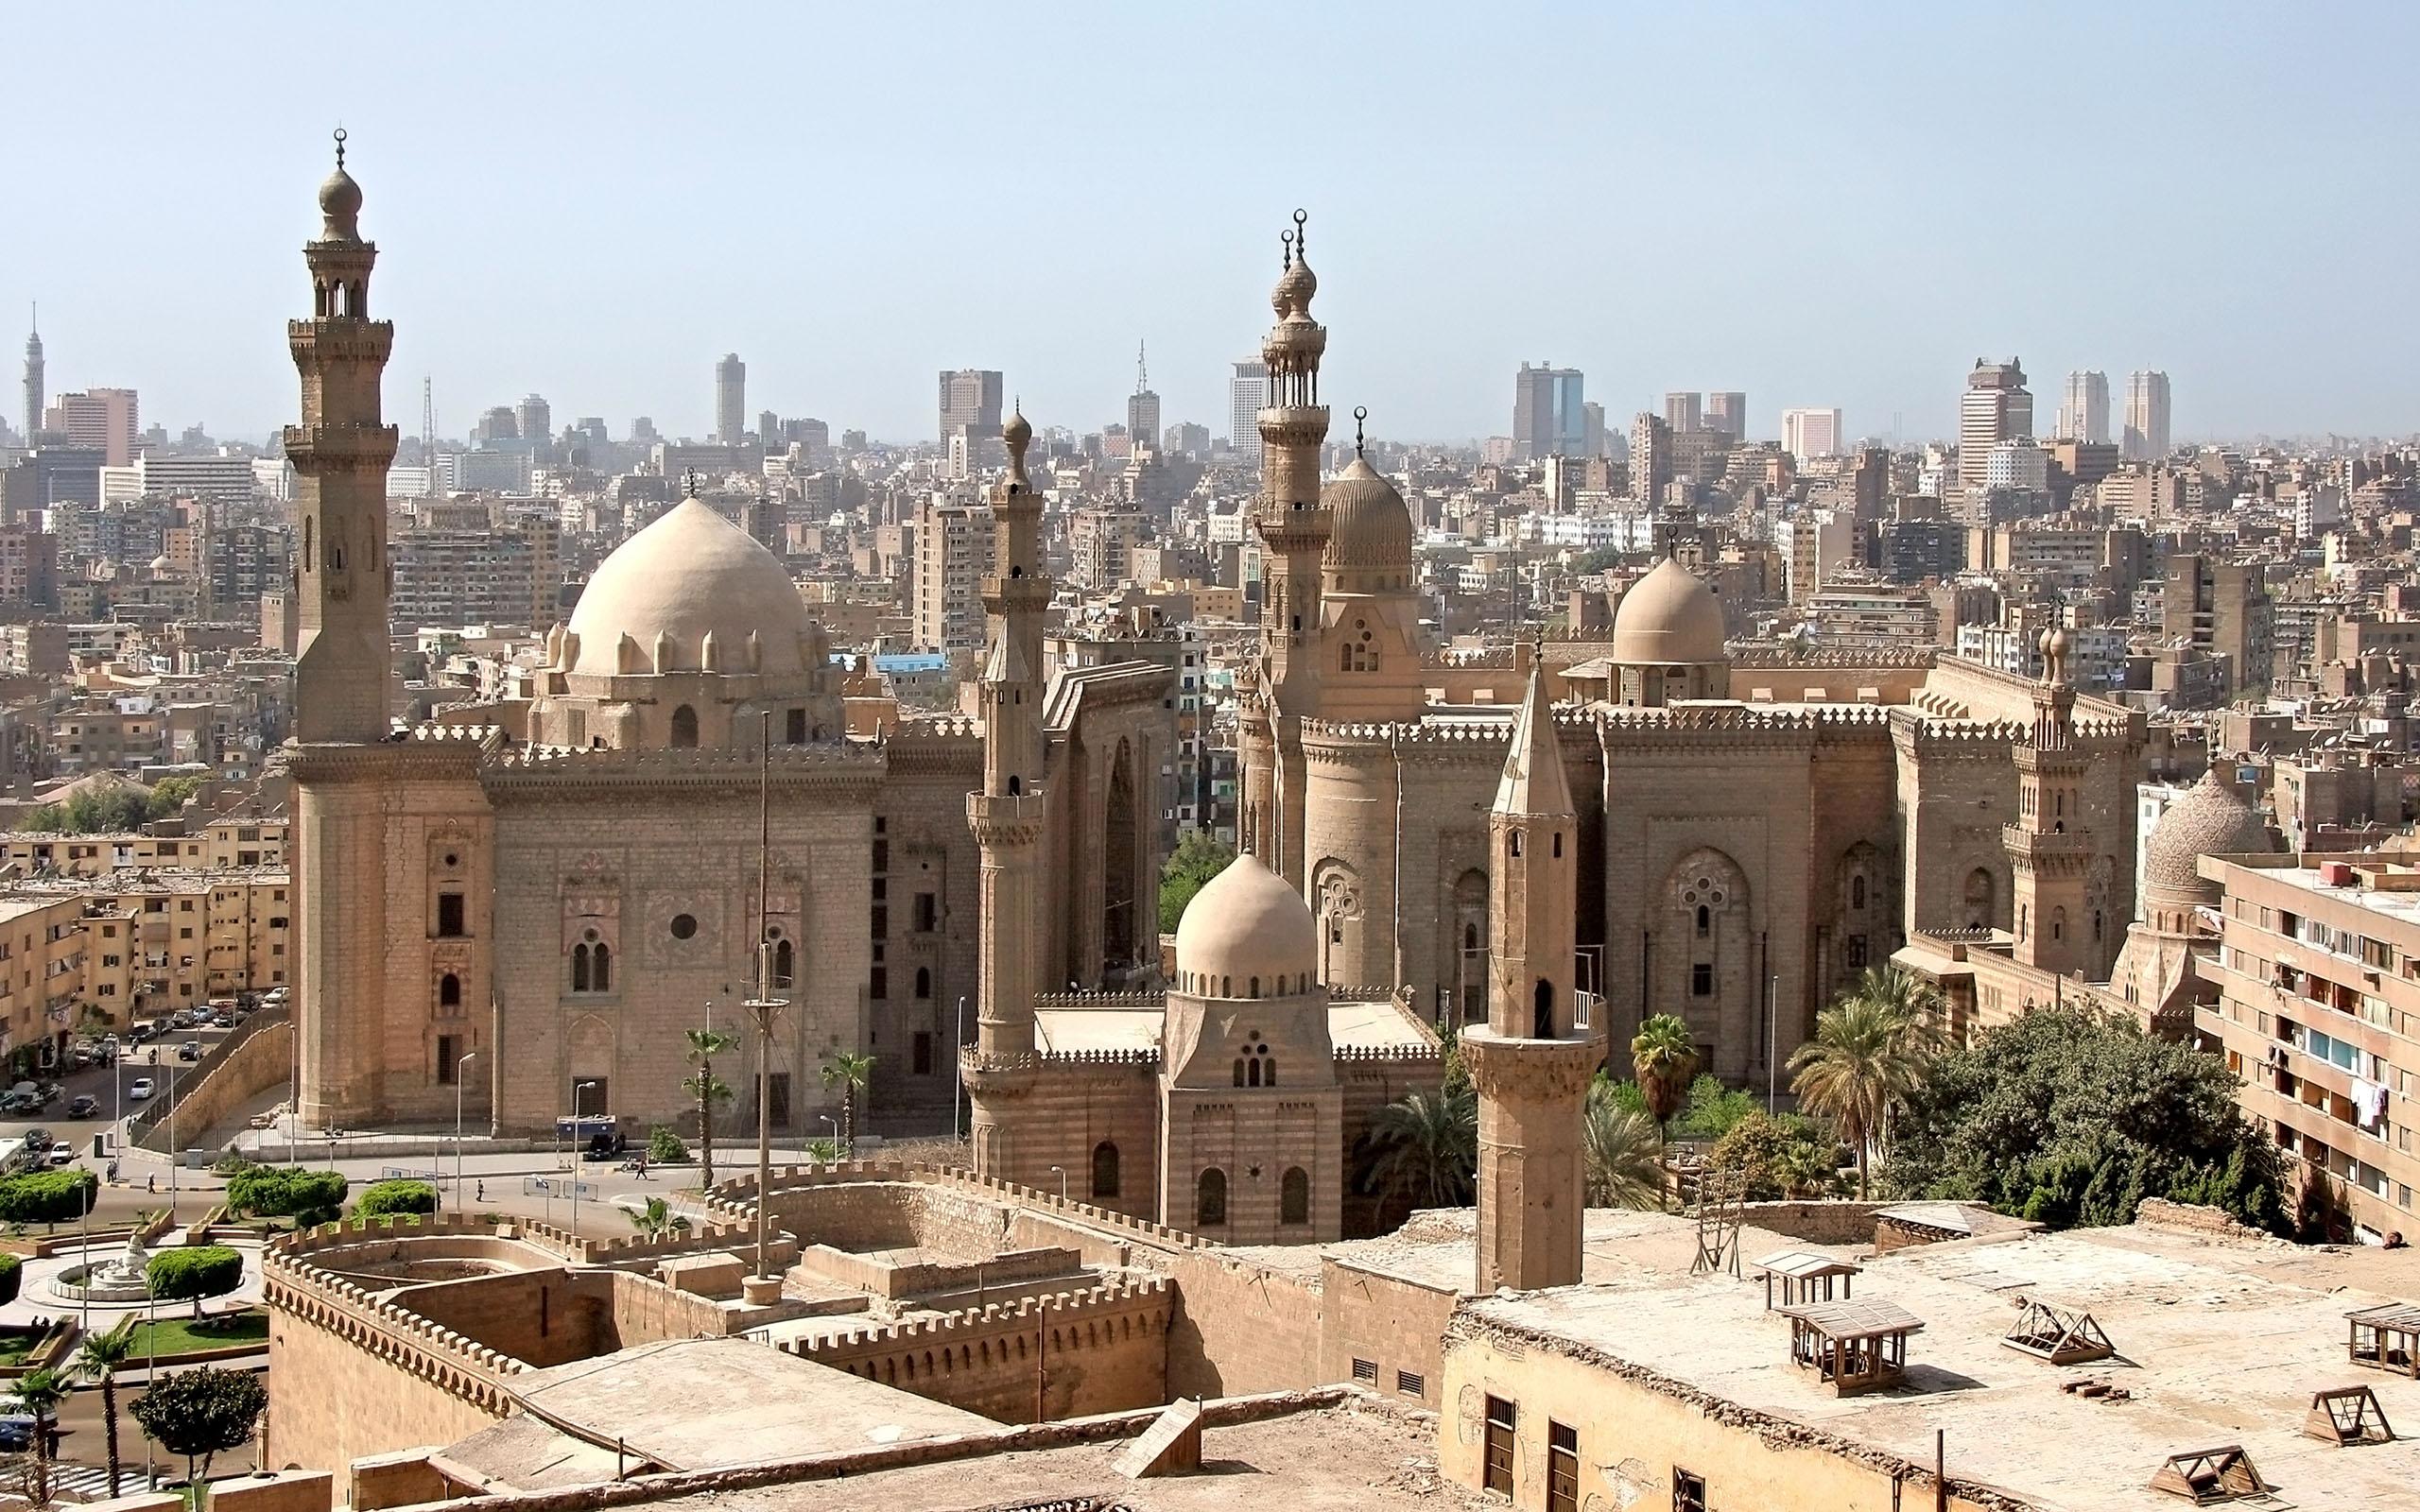 Kairo letovanje cene aranžmana letovanje avionom Egipat